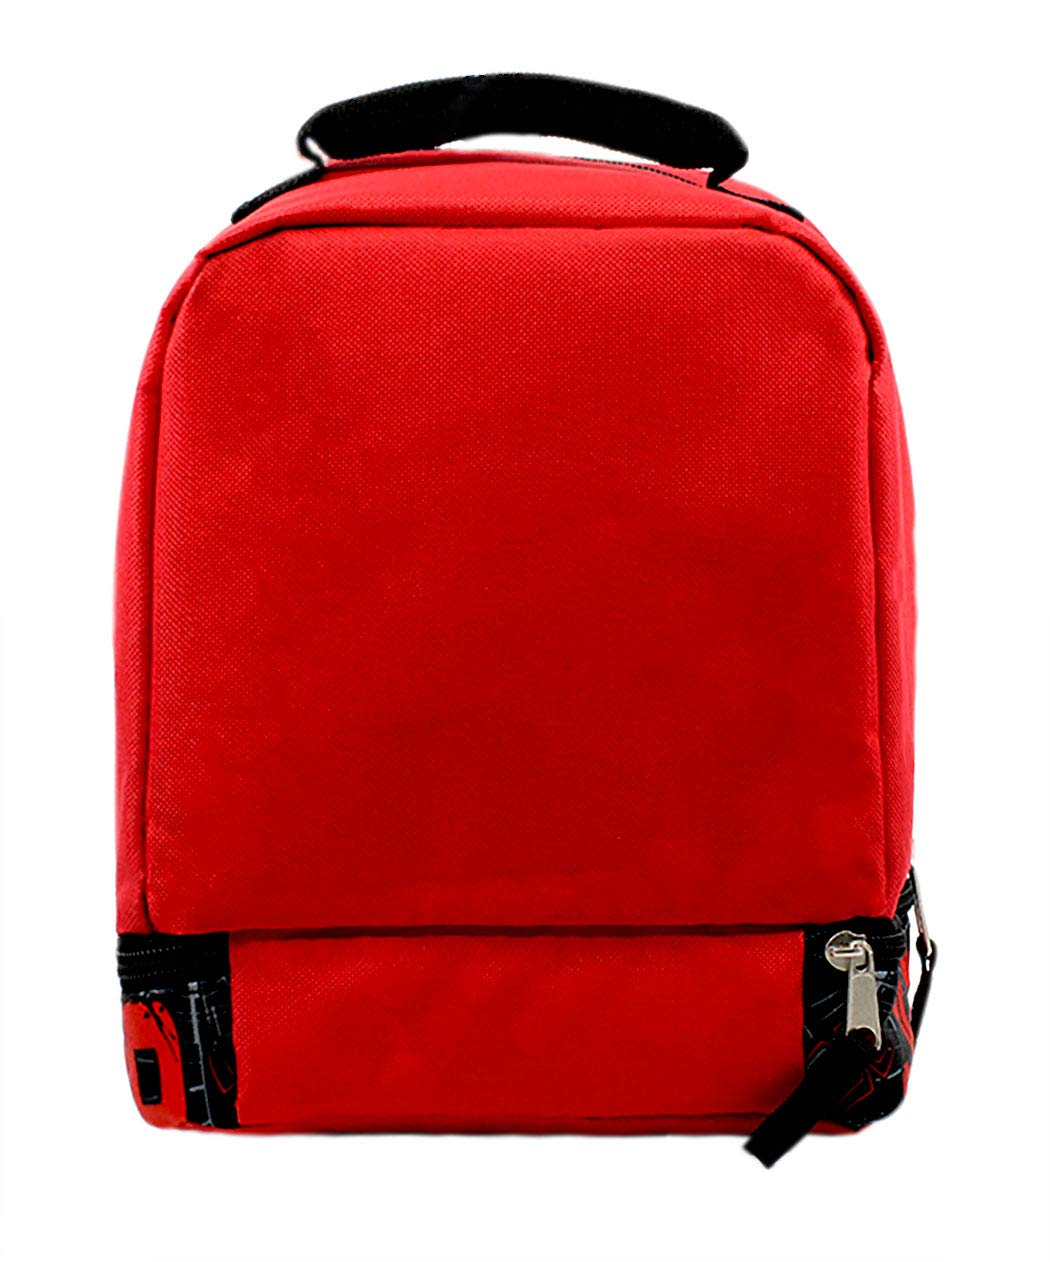 Licensed Spiderman Lunch Bag